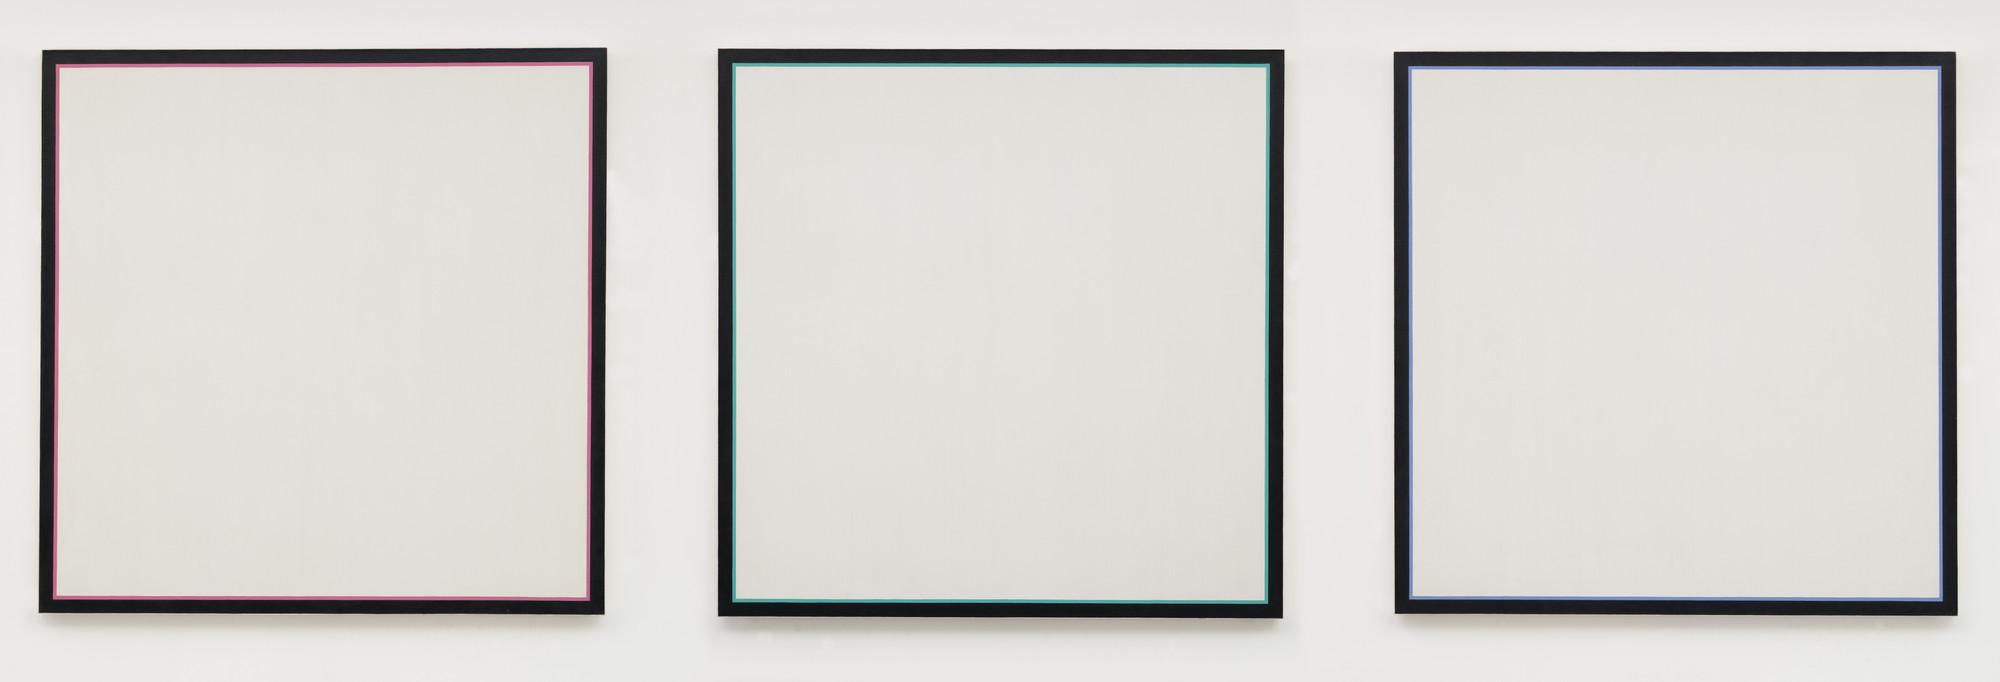 Jo Baer. Primary Light Group: Red, Green, Blue. 1964-65 | MoMA